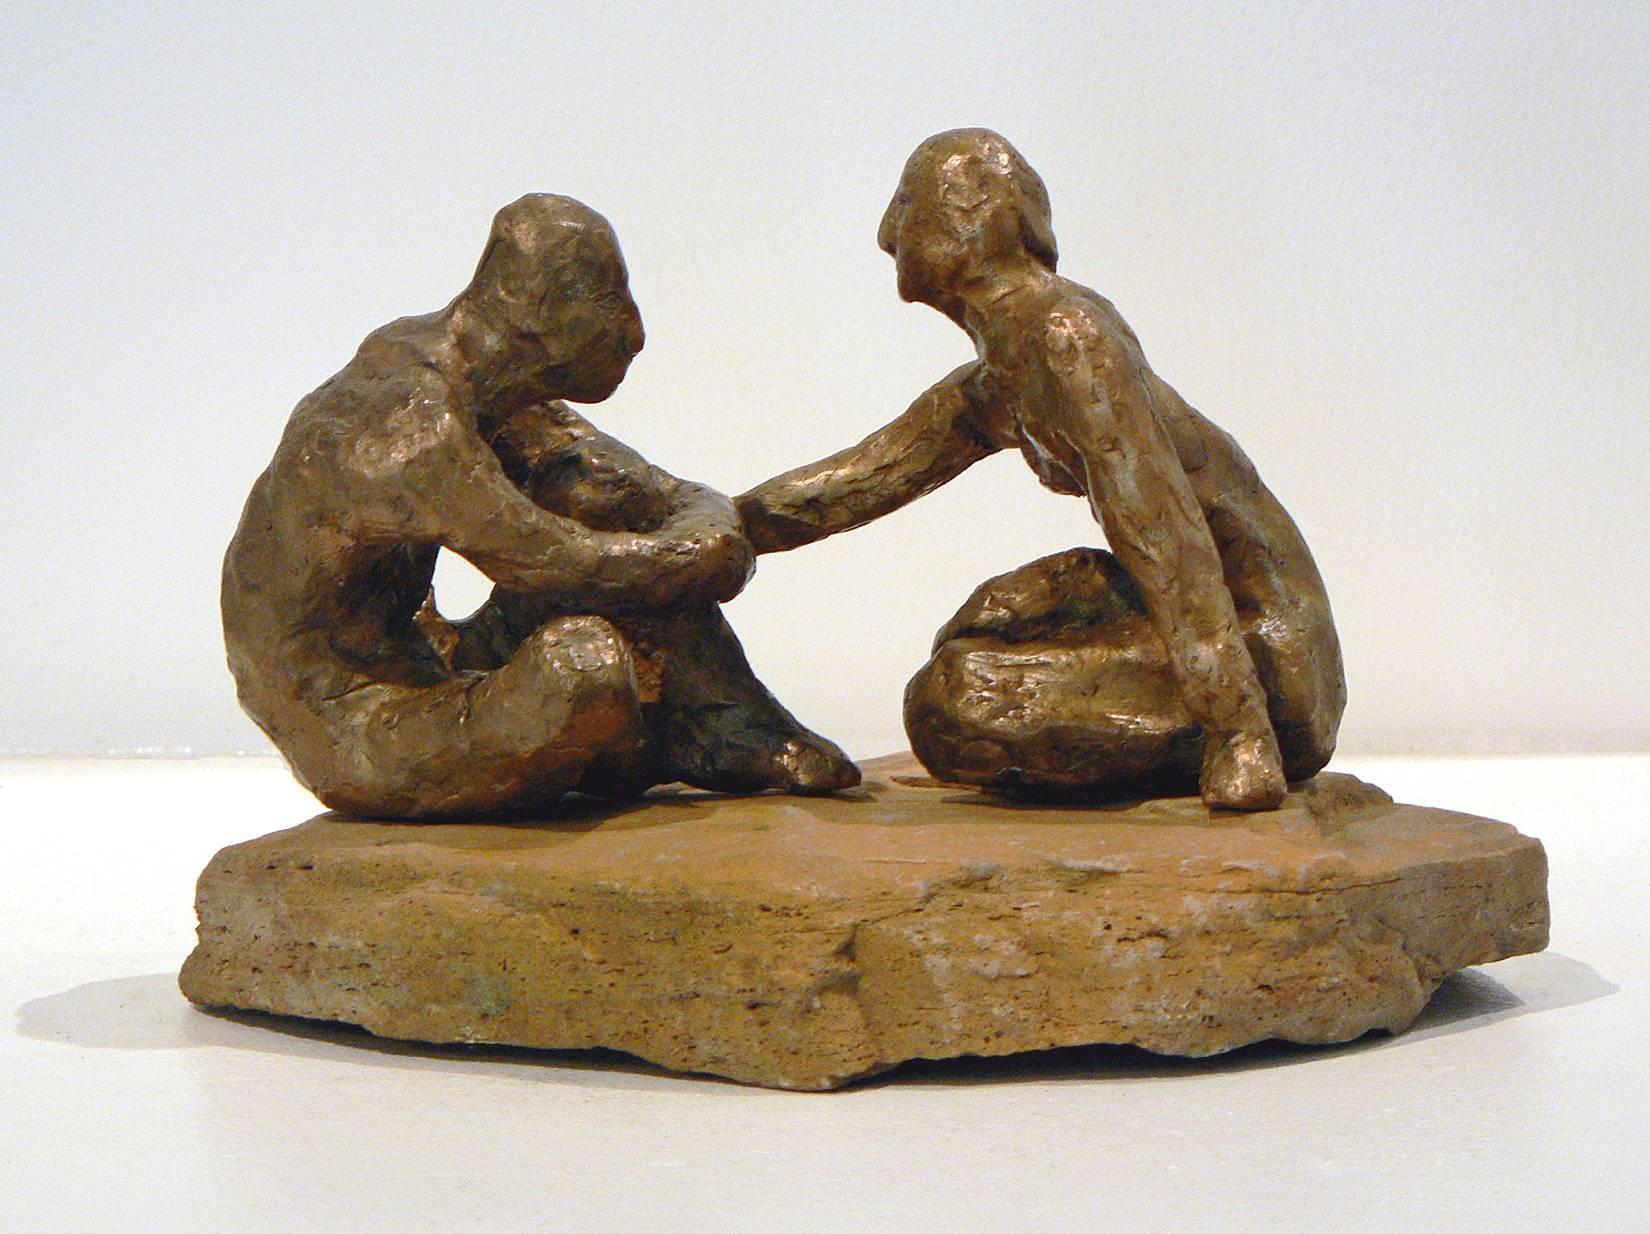 Comfort -figurative bronze on stone sculpture by New York artist Noa Bornstein